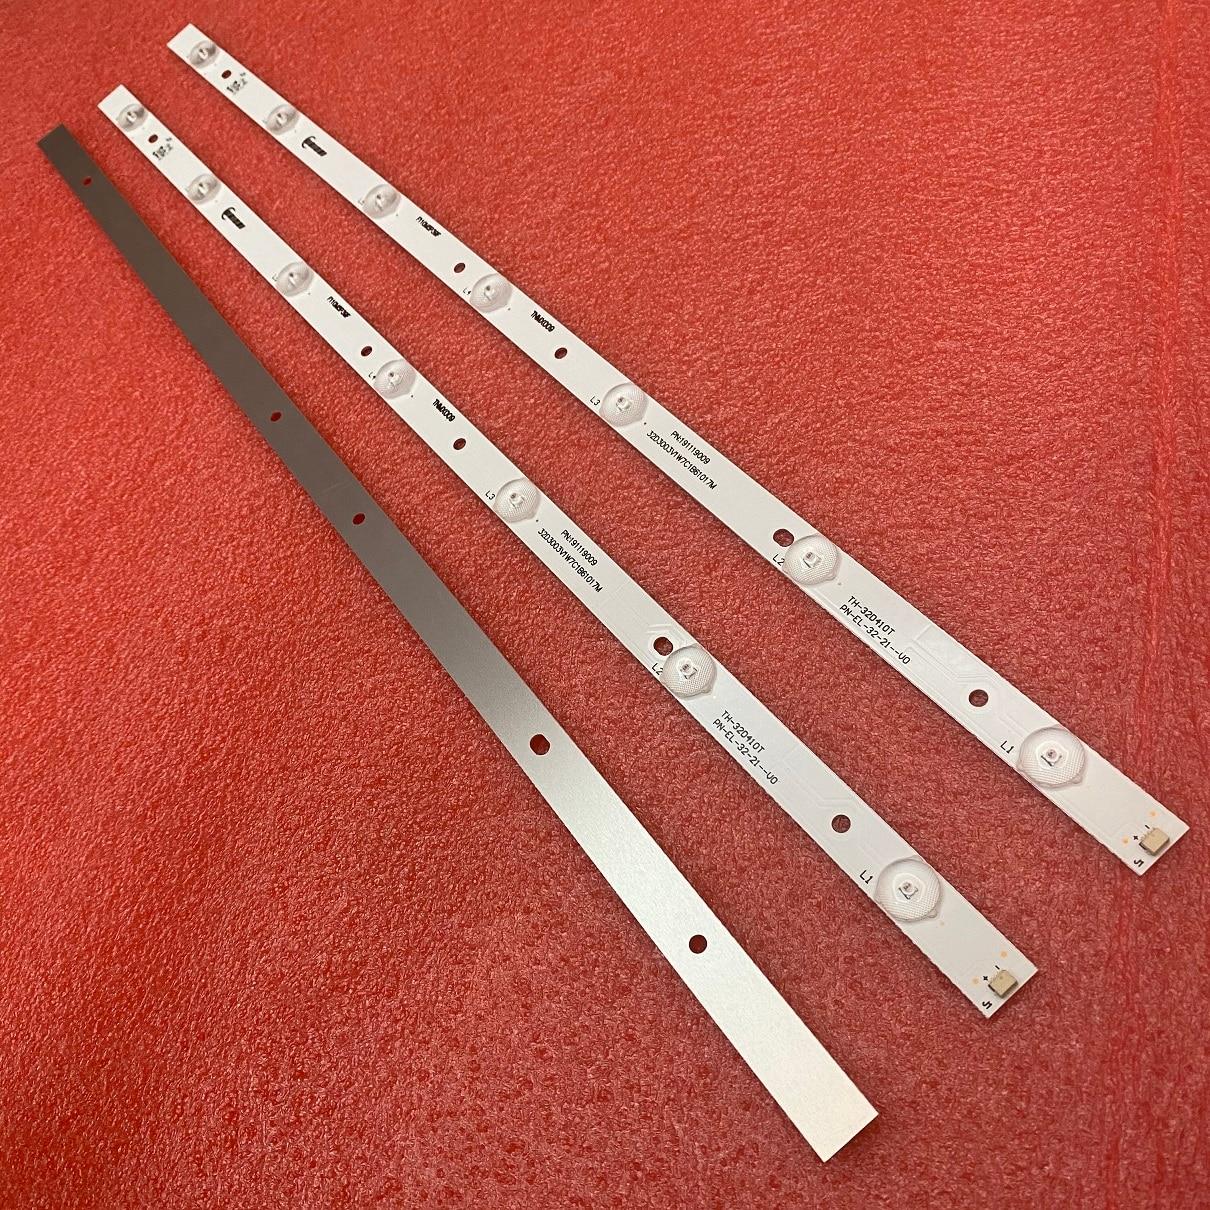 LED الخلفية لباناسونيك TX-32ES400E TX-32ES500E TX-32DS500E TX-32ES503E TX-32FS503E TX-32FS500E TX-32CS510B TX-32DS500B